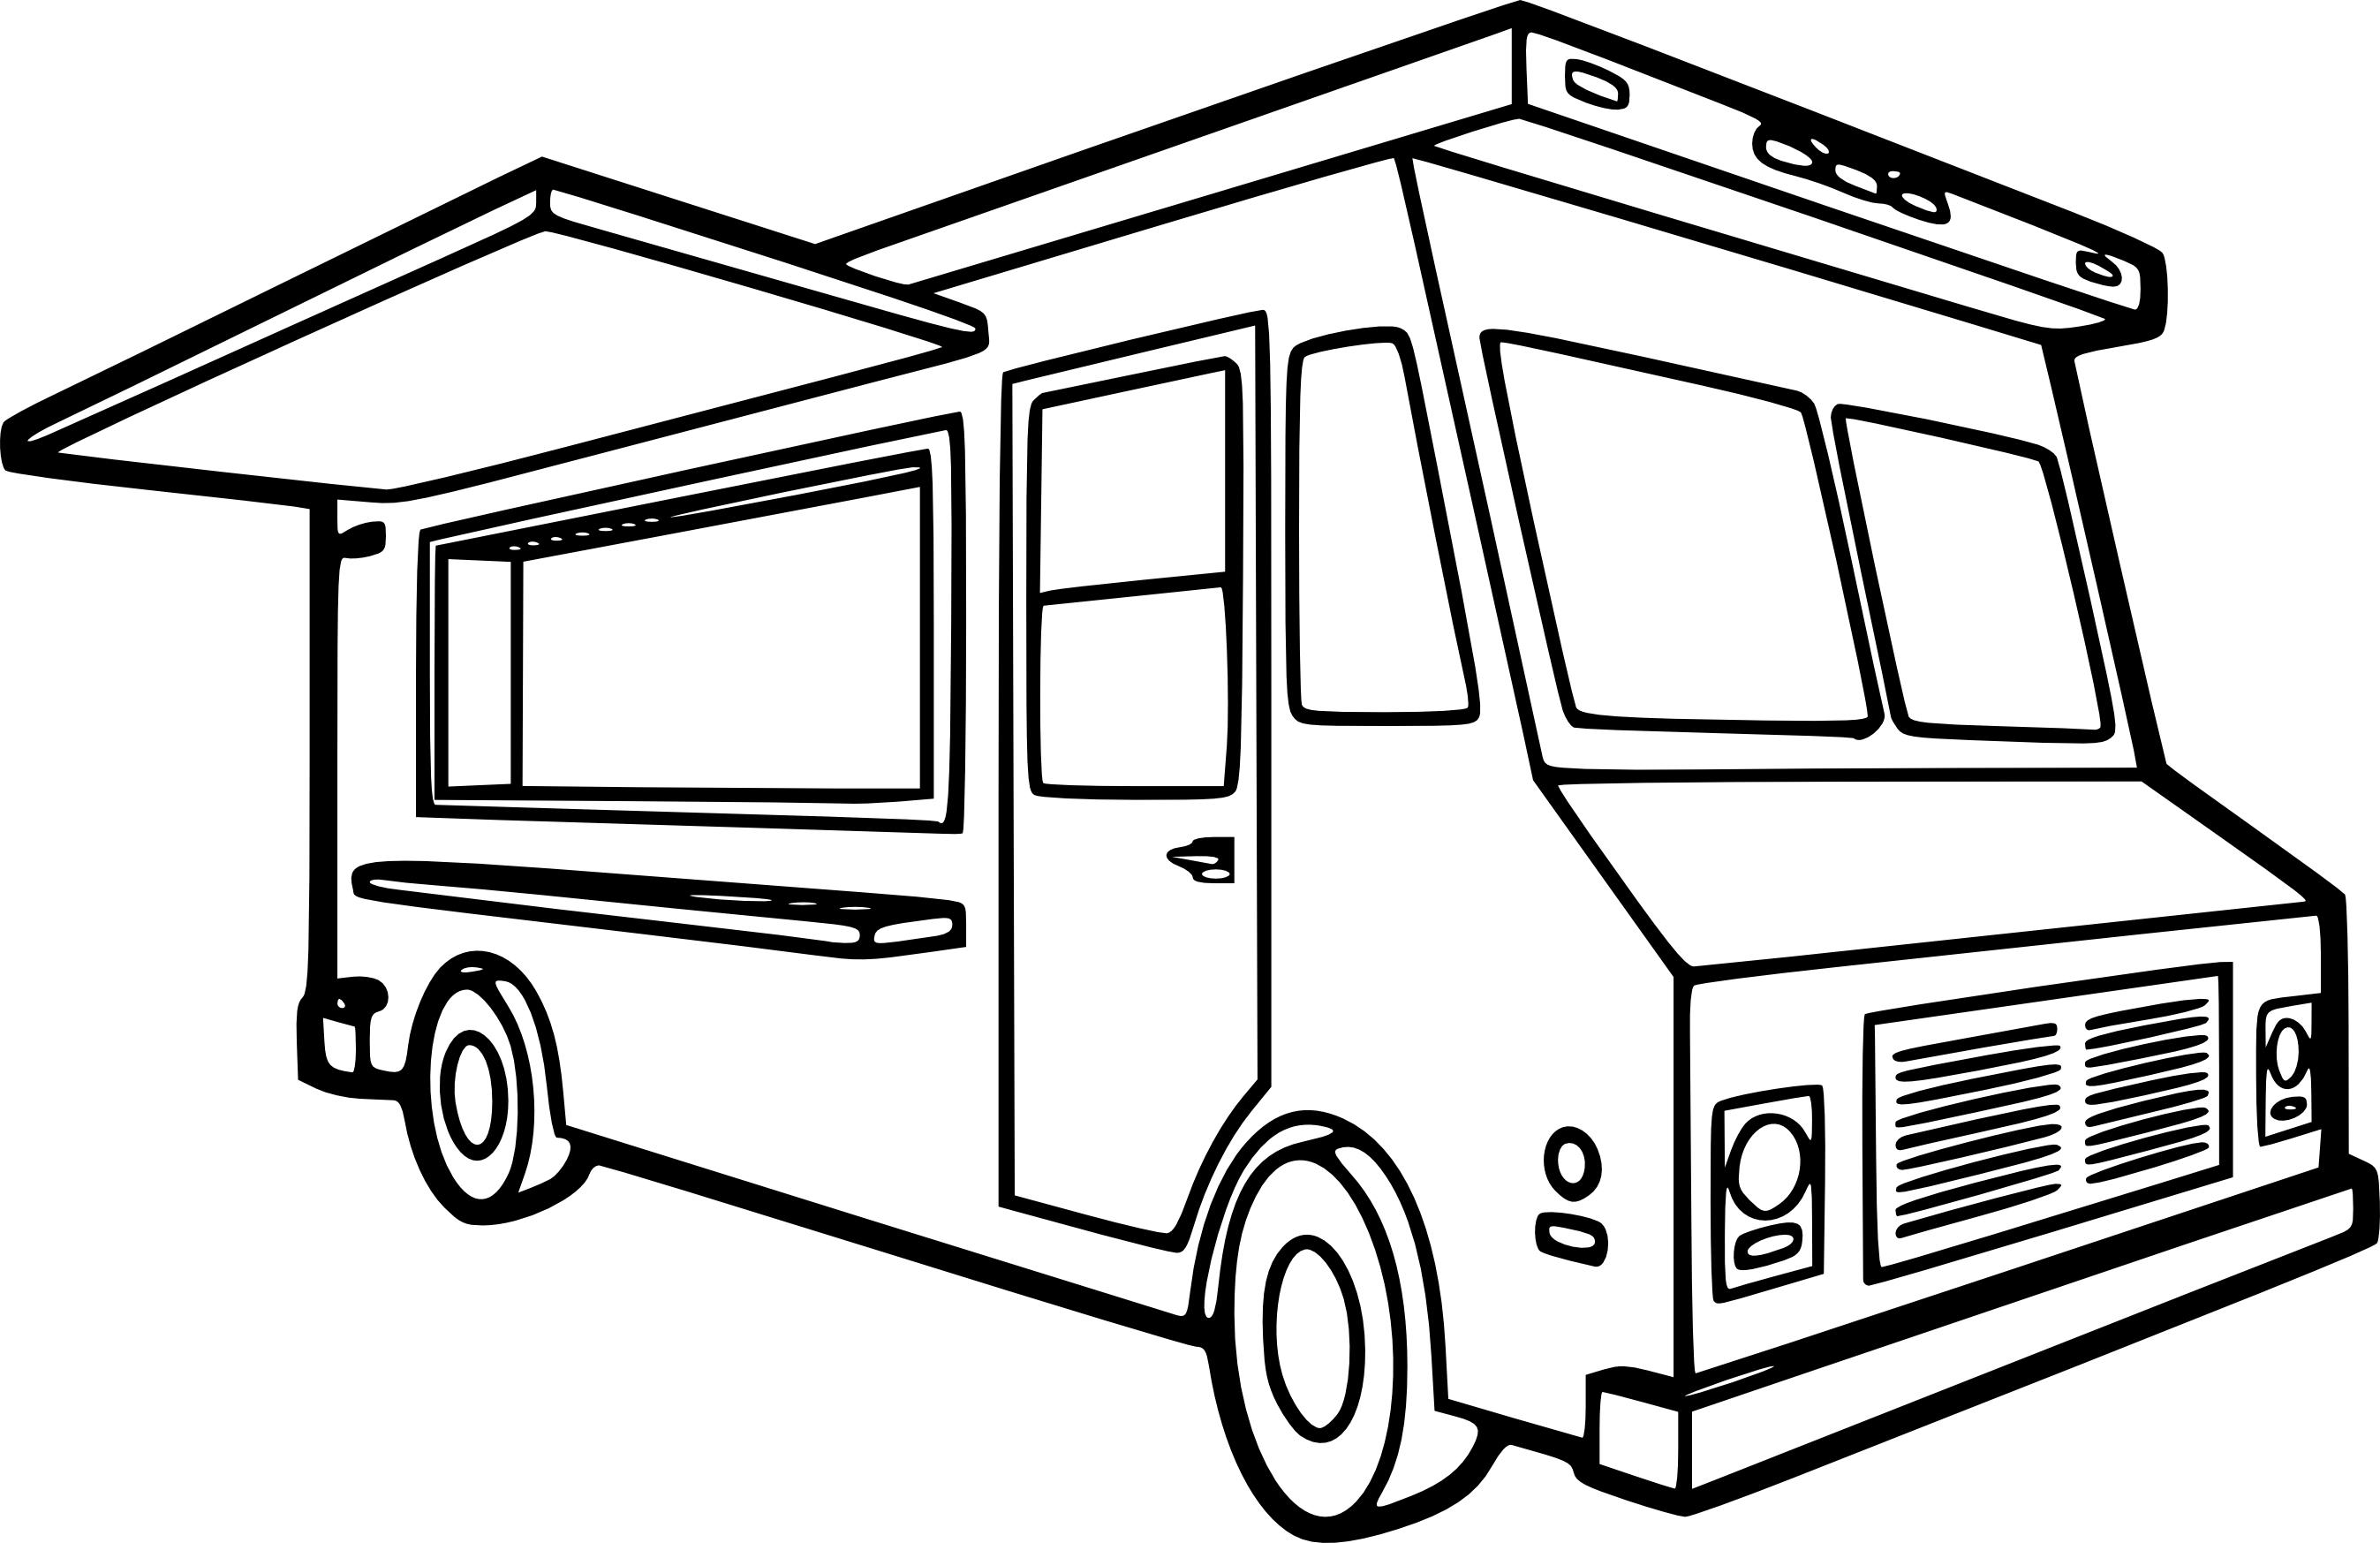 Coloriage camping car imprimer - Dessin a colorier camping car gratuit ...